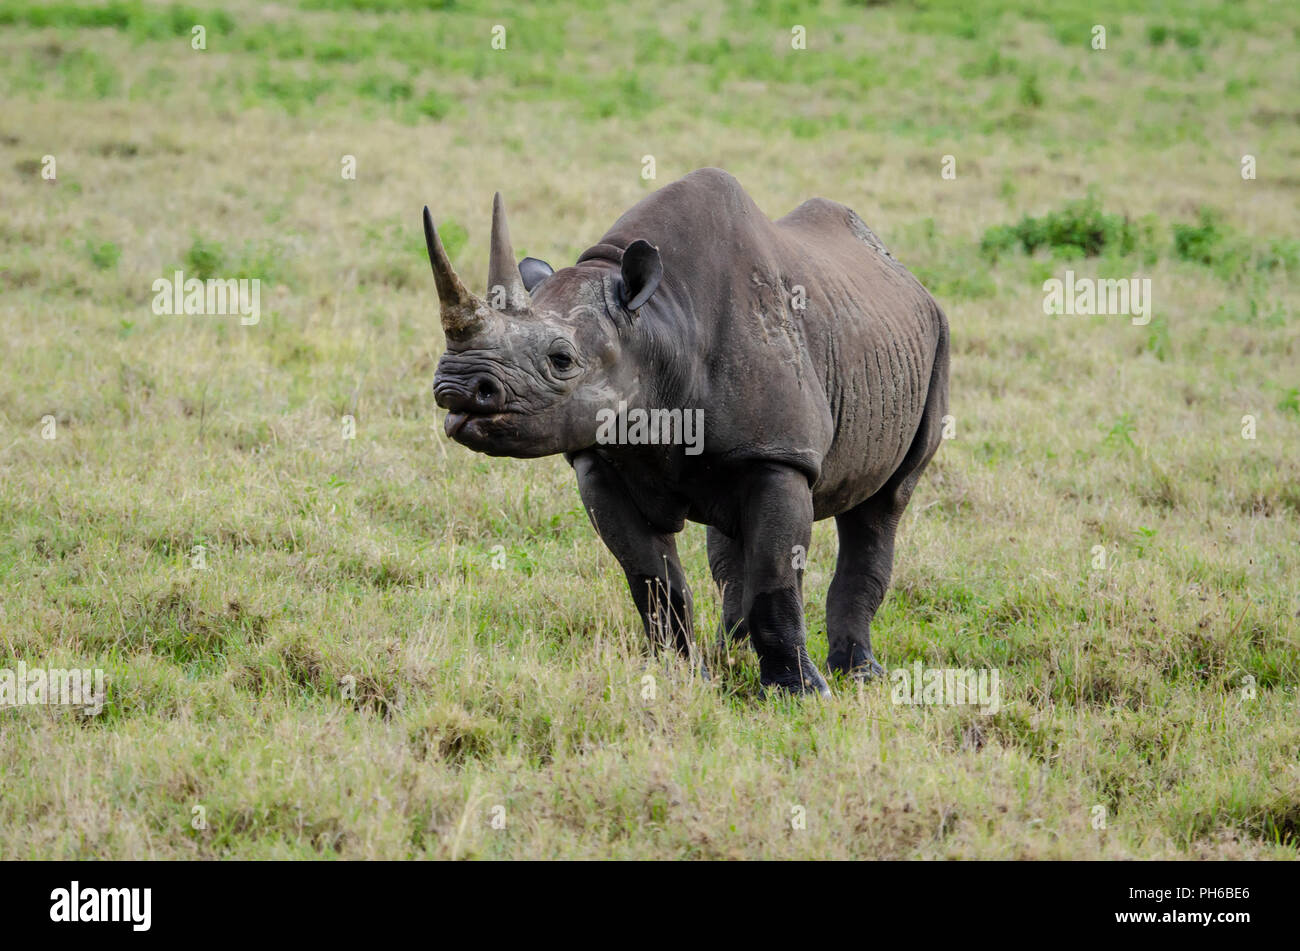 Black rhinoceros (Diceros bicornis) in Ngorongoro Crater in Tanzania - Stock Image